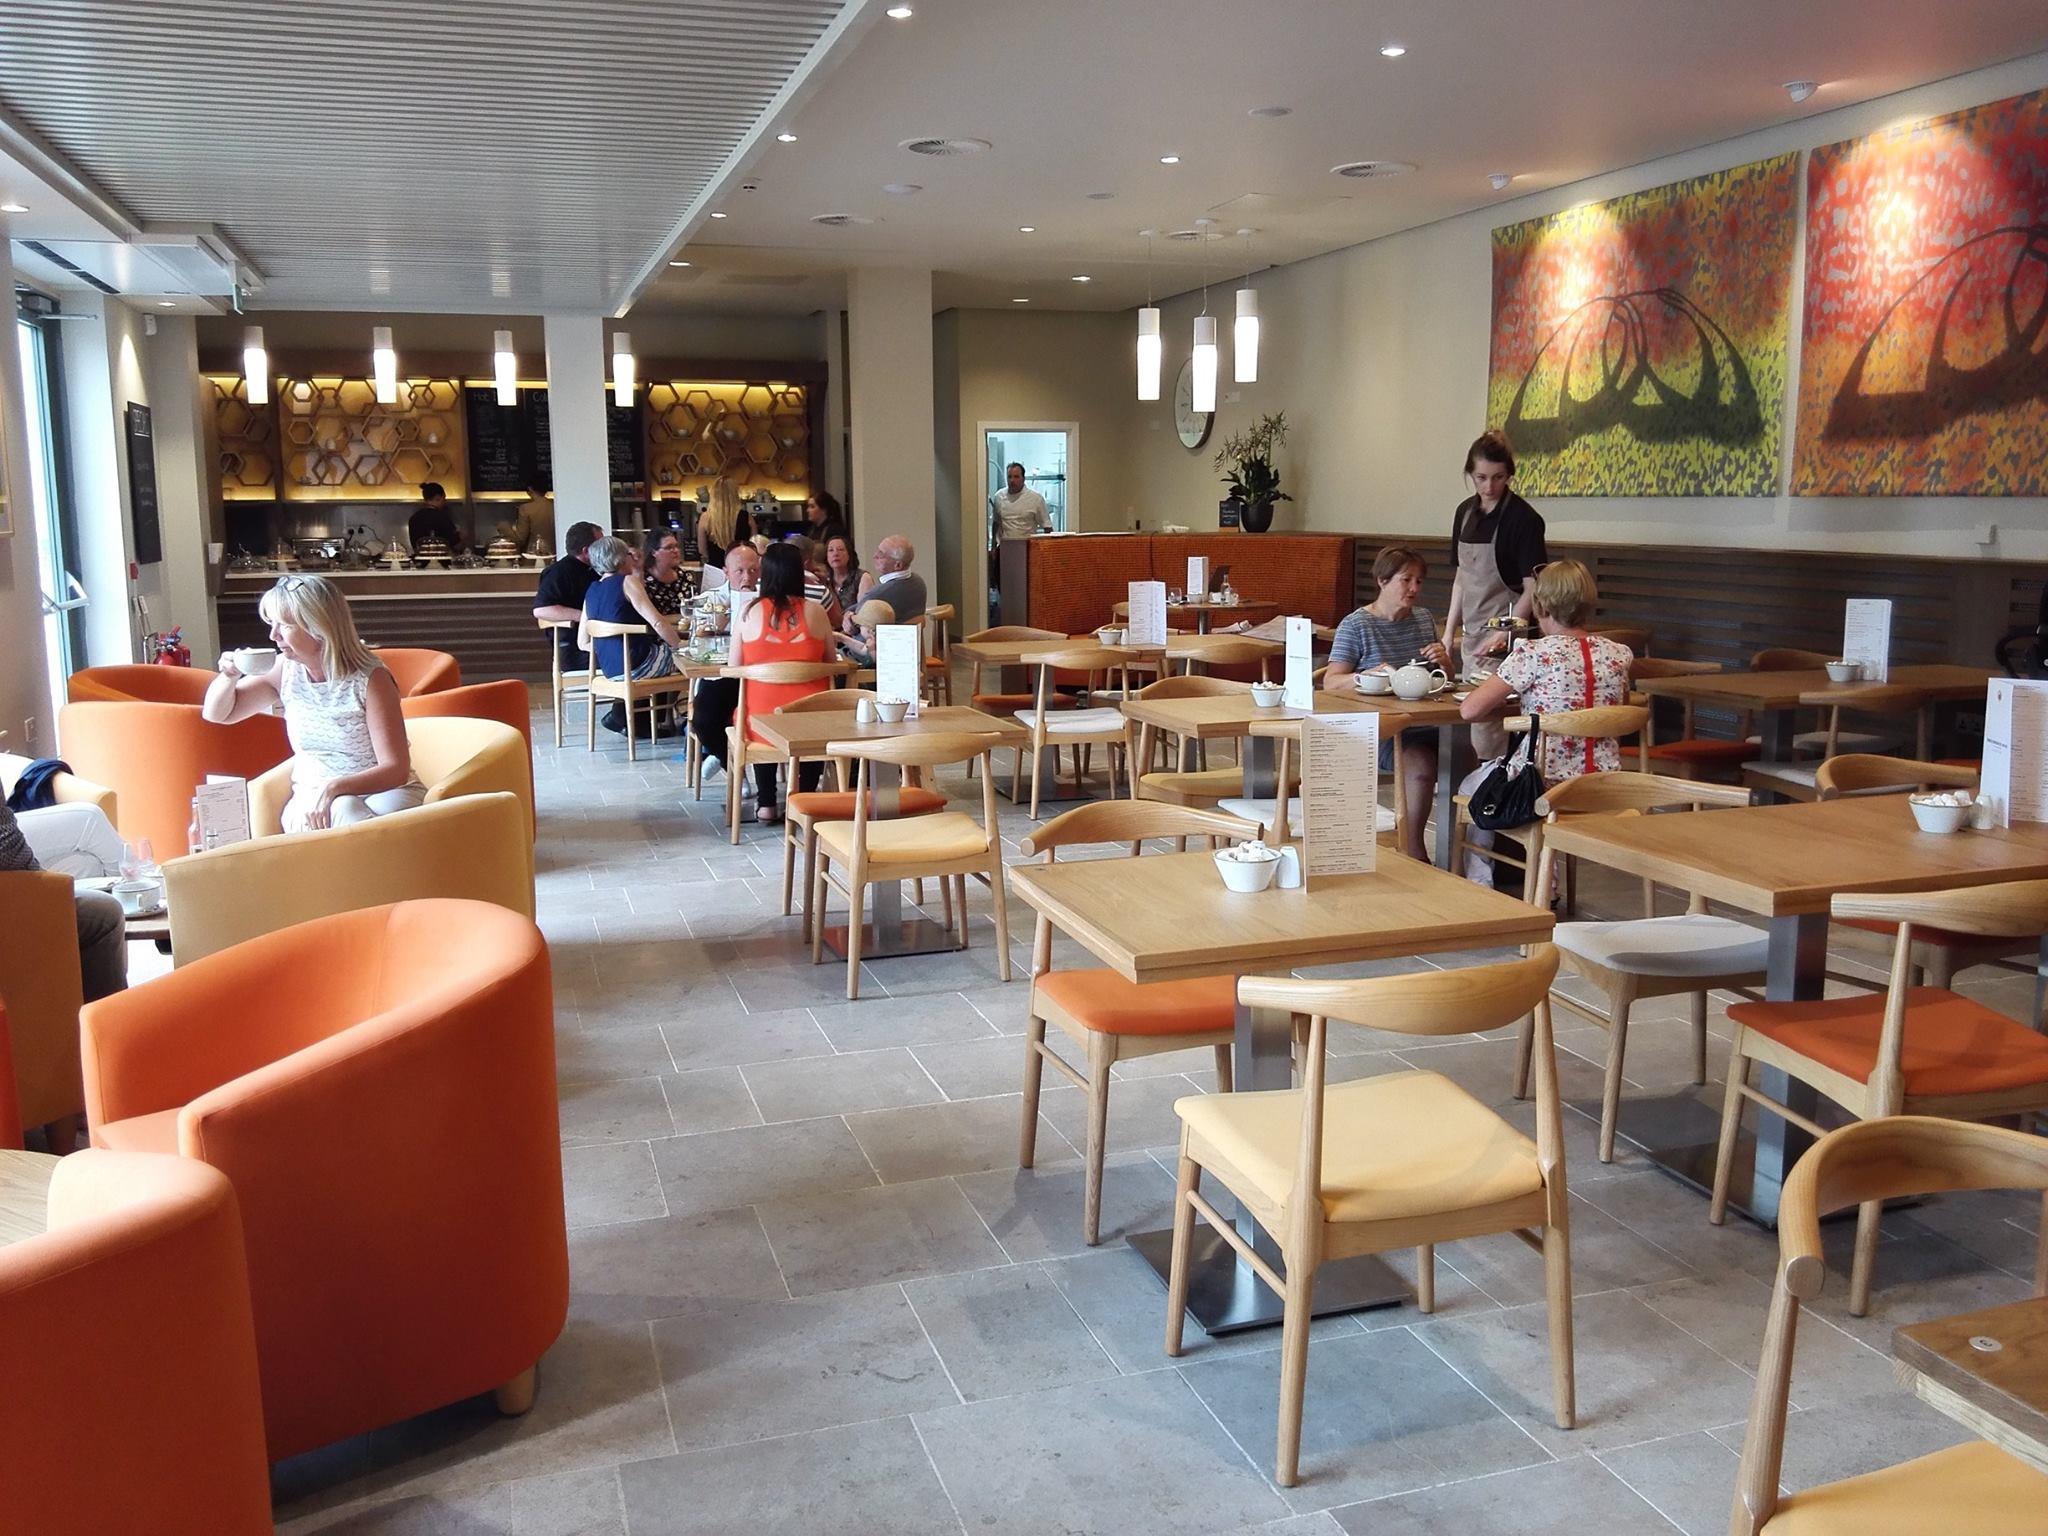 Northcote Cafe Blackburn Interior